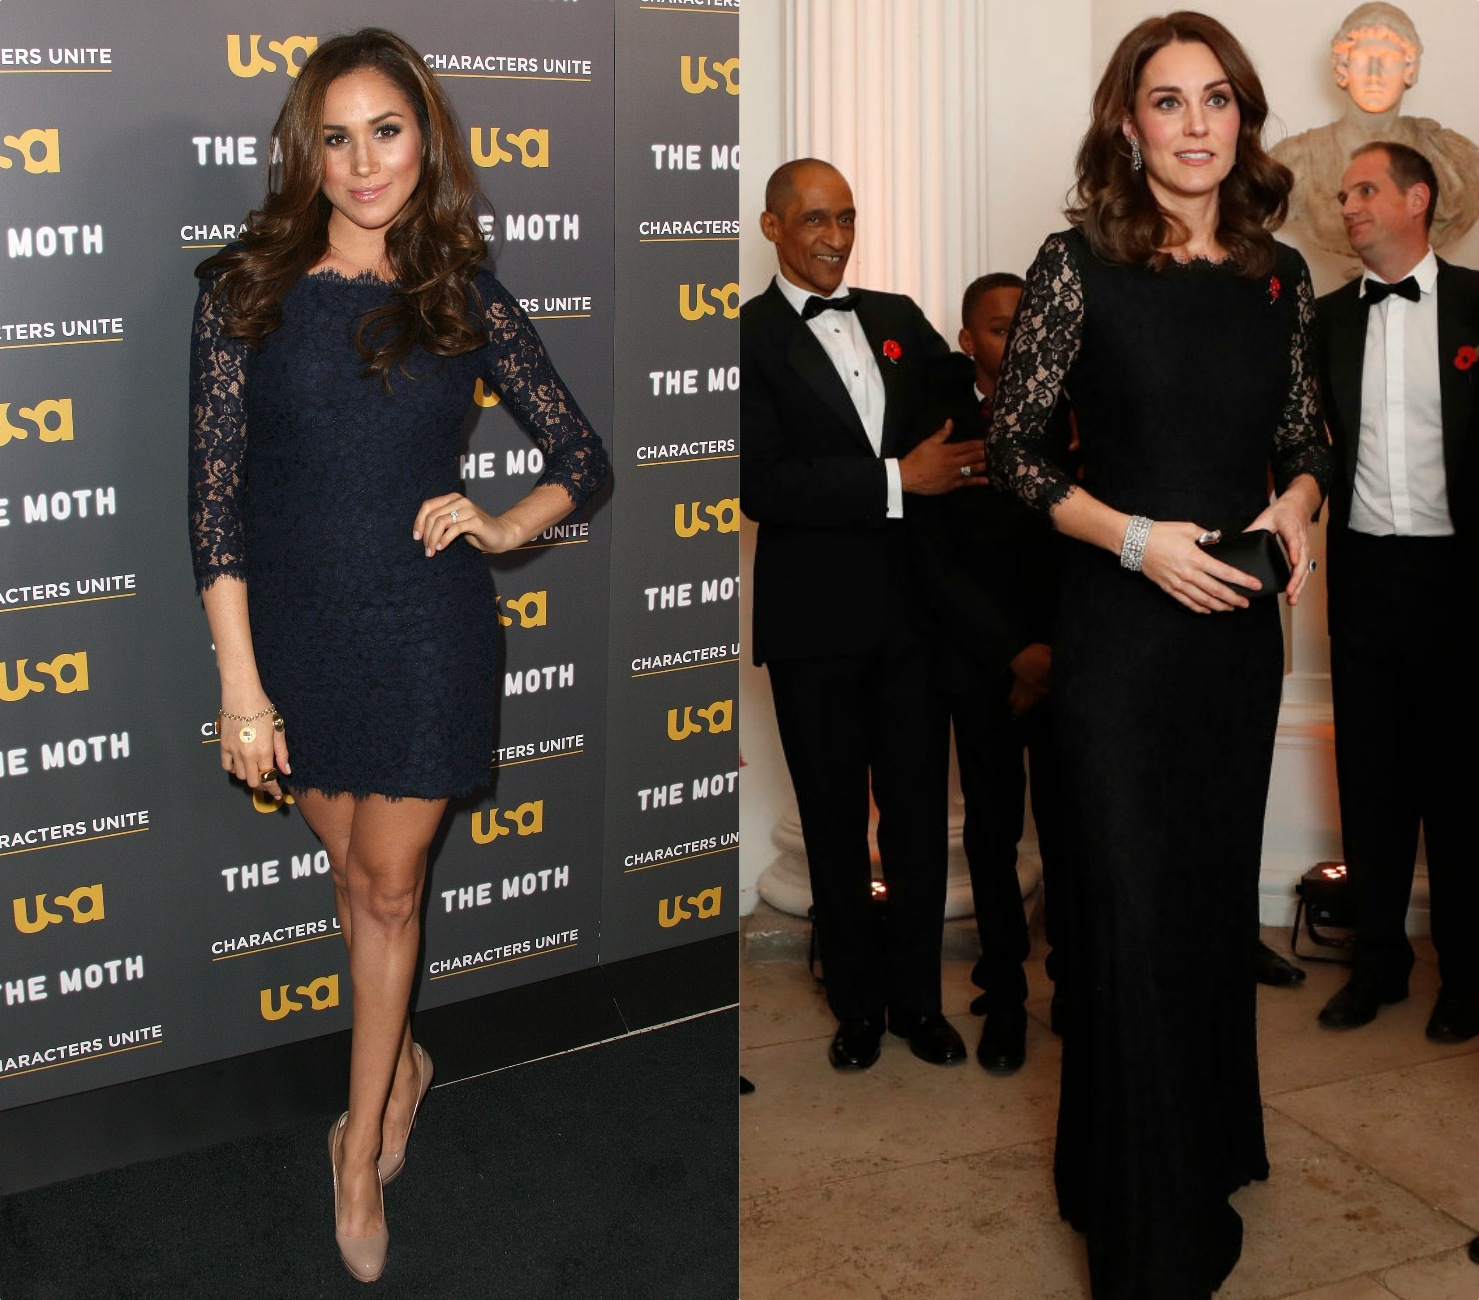 Meghan Markle and Kate Middleton dress